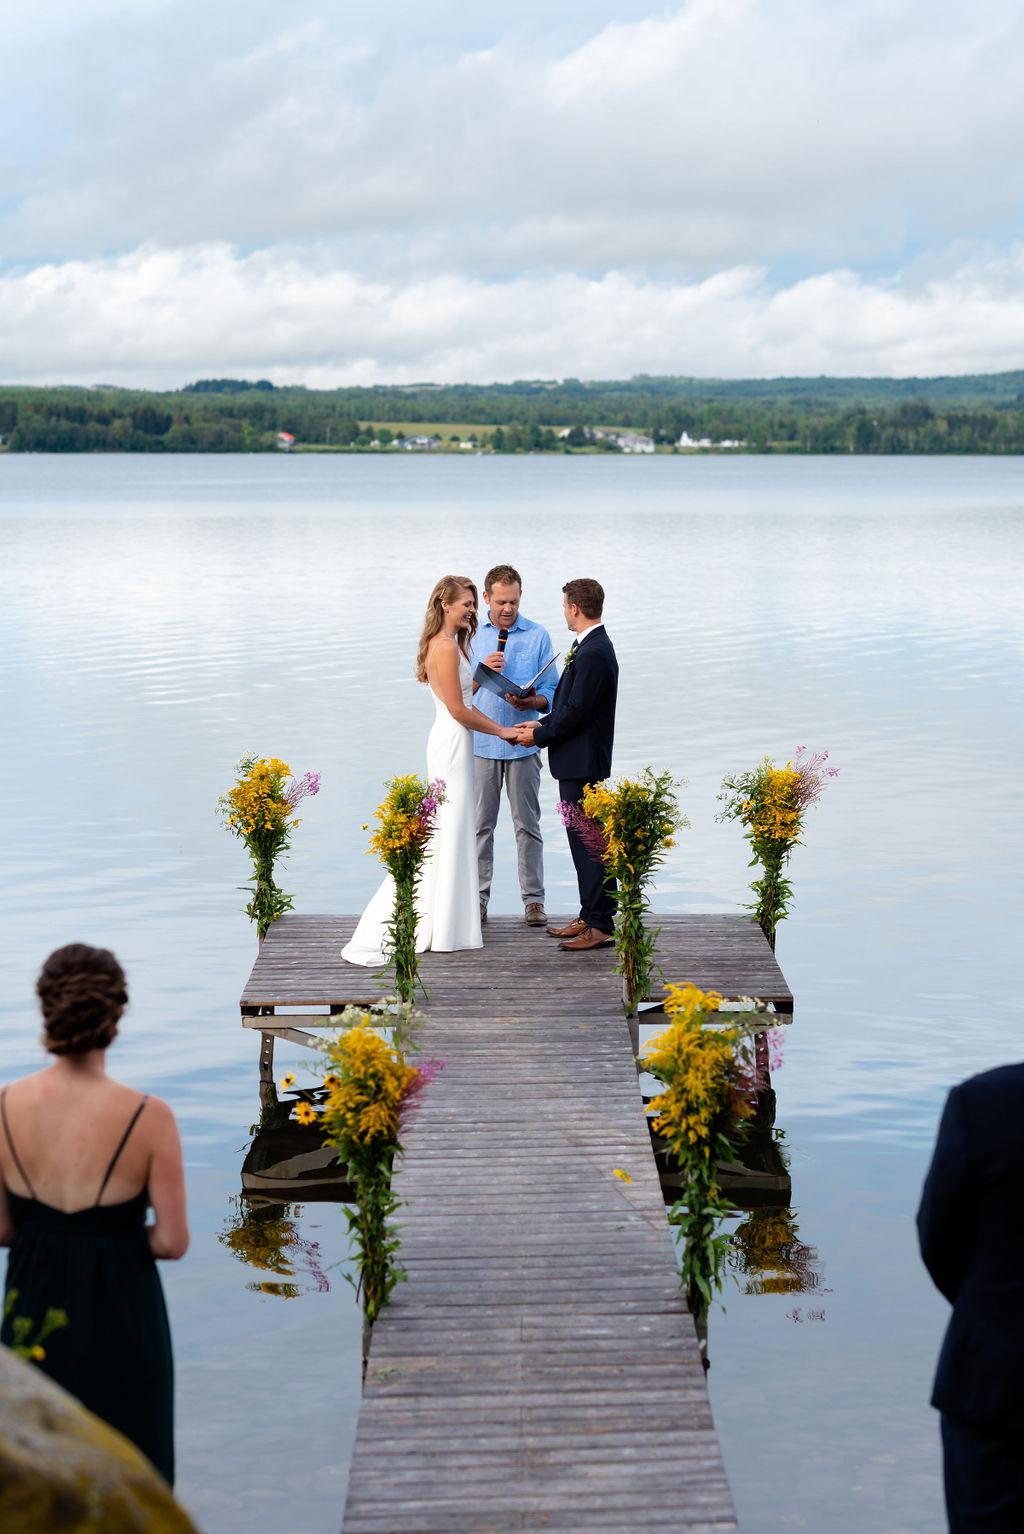 Pin on New England Wedding Photography